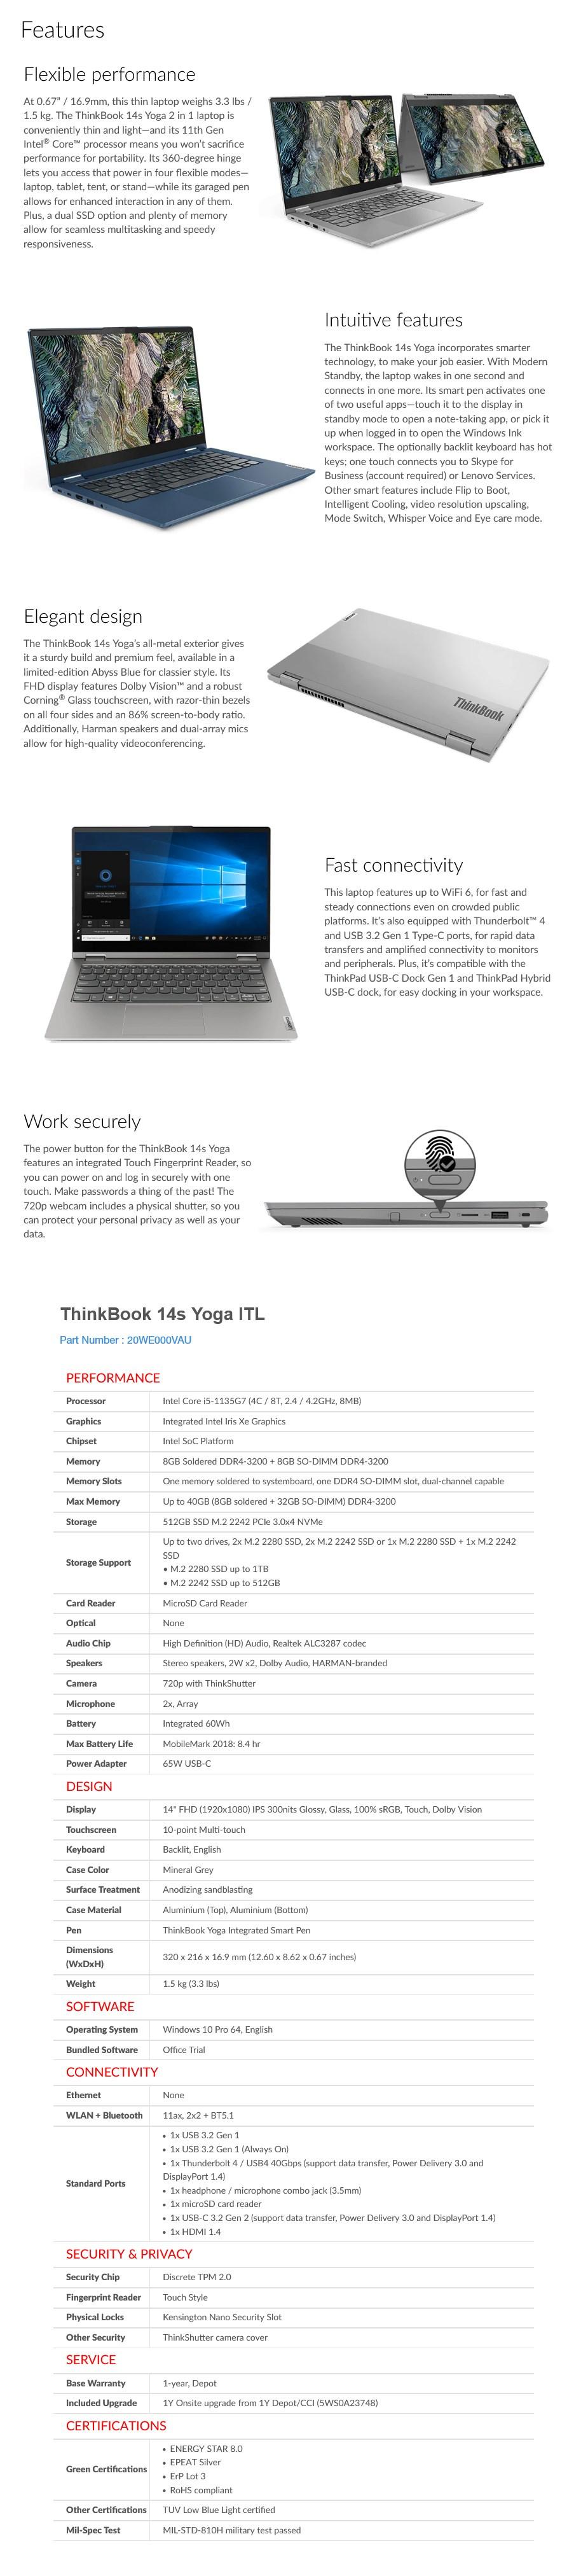 lenovo-thinkbook-14s-yoga-itl-14-2in1-laptop-i51135g7-16gb-512gb-w10p-touch-ac44114-5.jpg